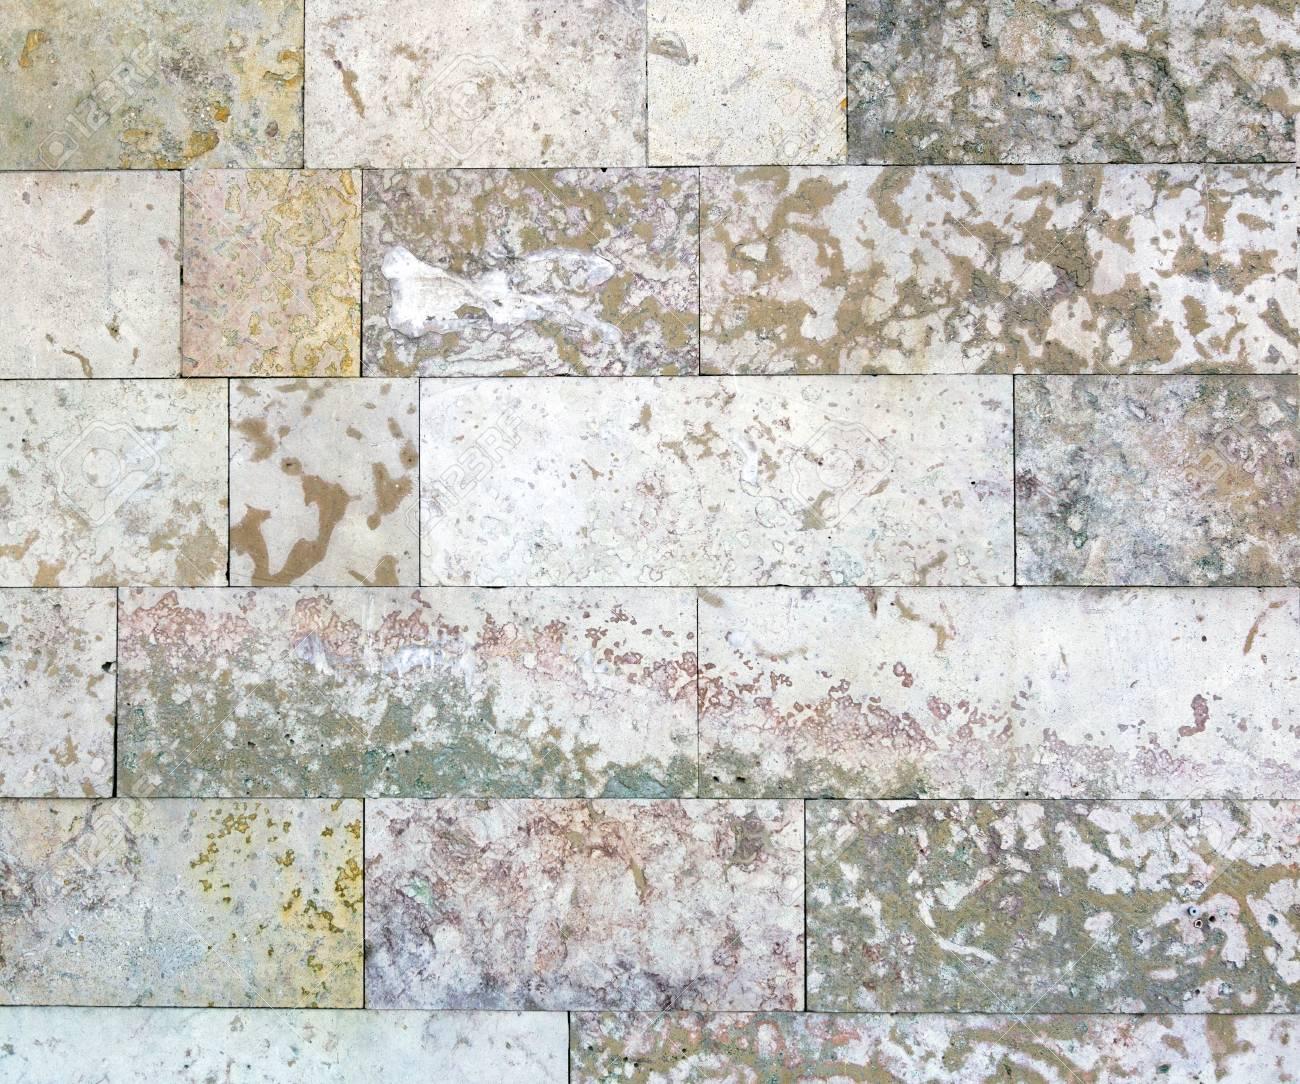 Wall, Tiles, Marble Tiles, Gray, Light, Tile, Ceramic, Abstract ...